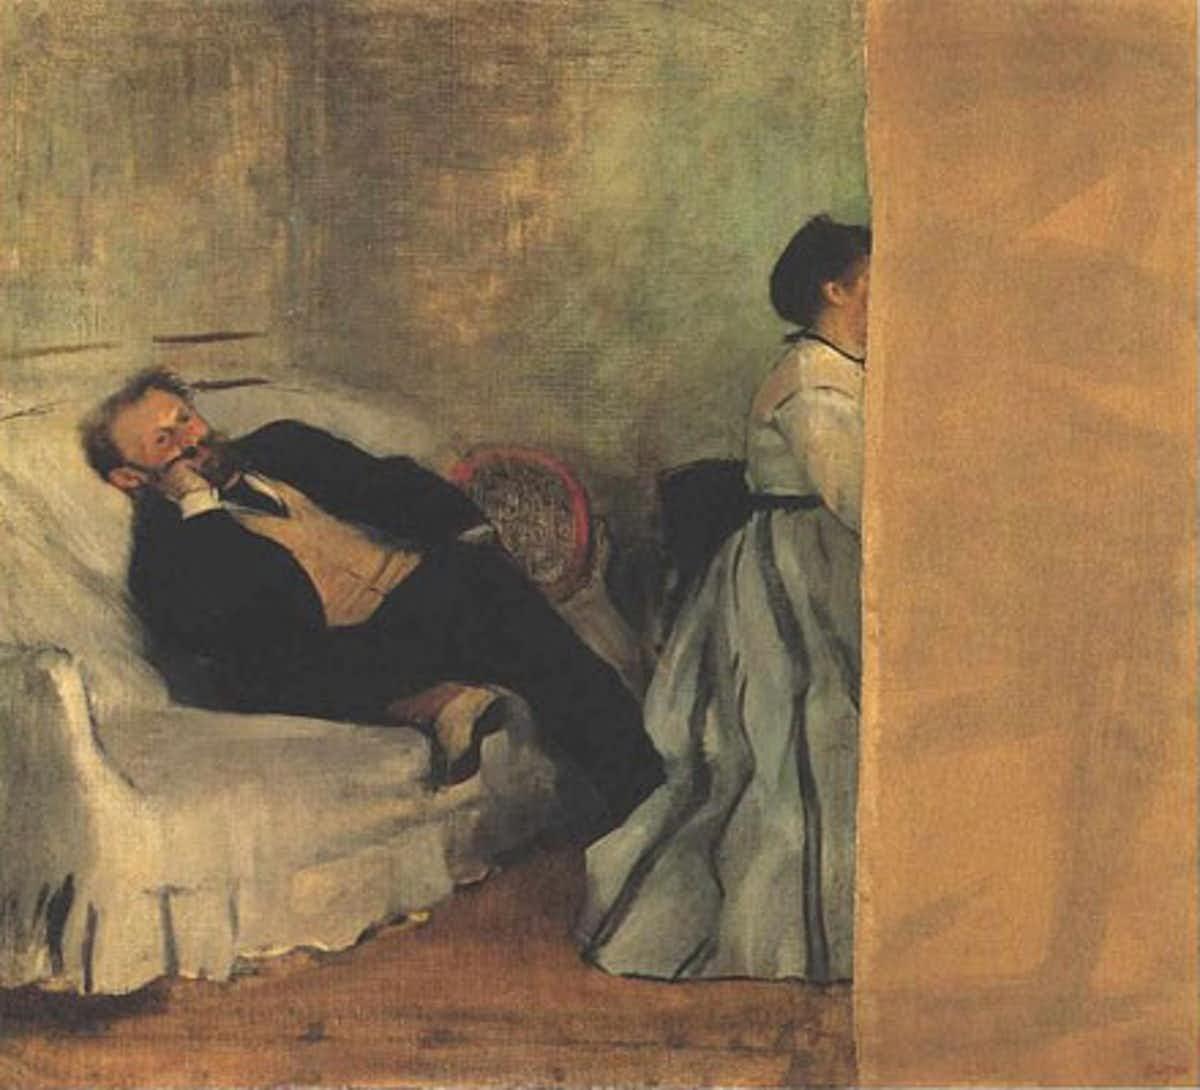 Edouard Manet and Madame Manet, oil on canvas, 1868-69, Edgar Degas, Kitakyushu Municipal Museum of Art (Japan - Kitakyushu)